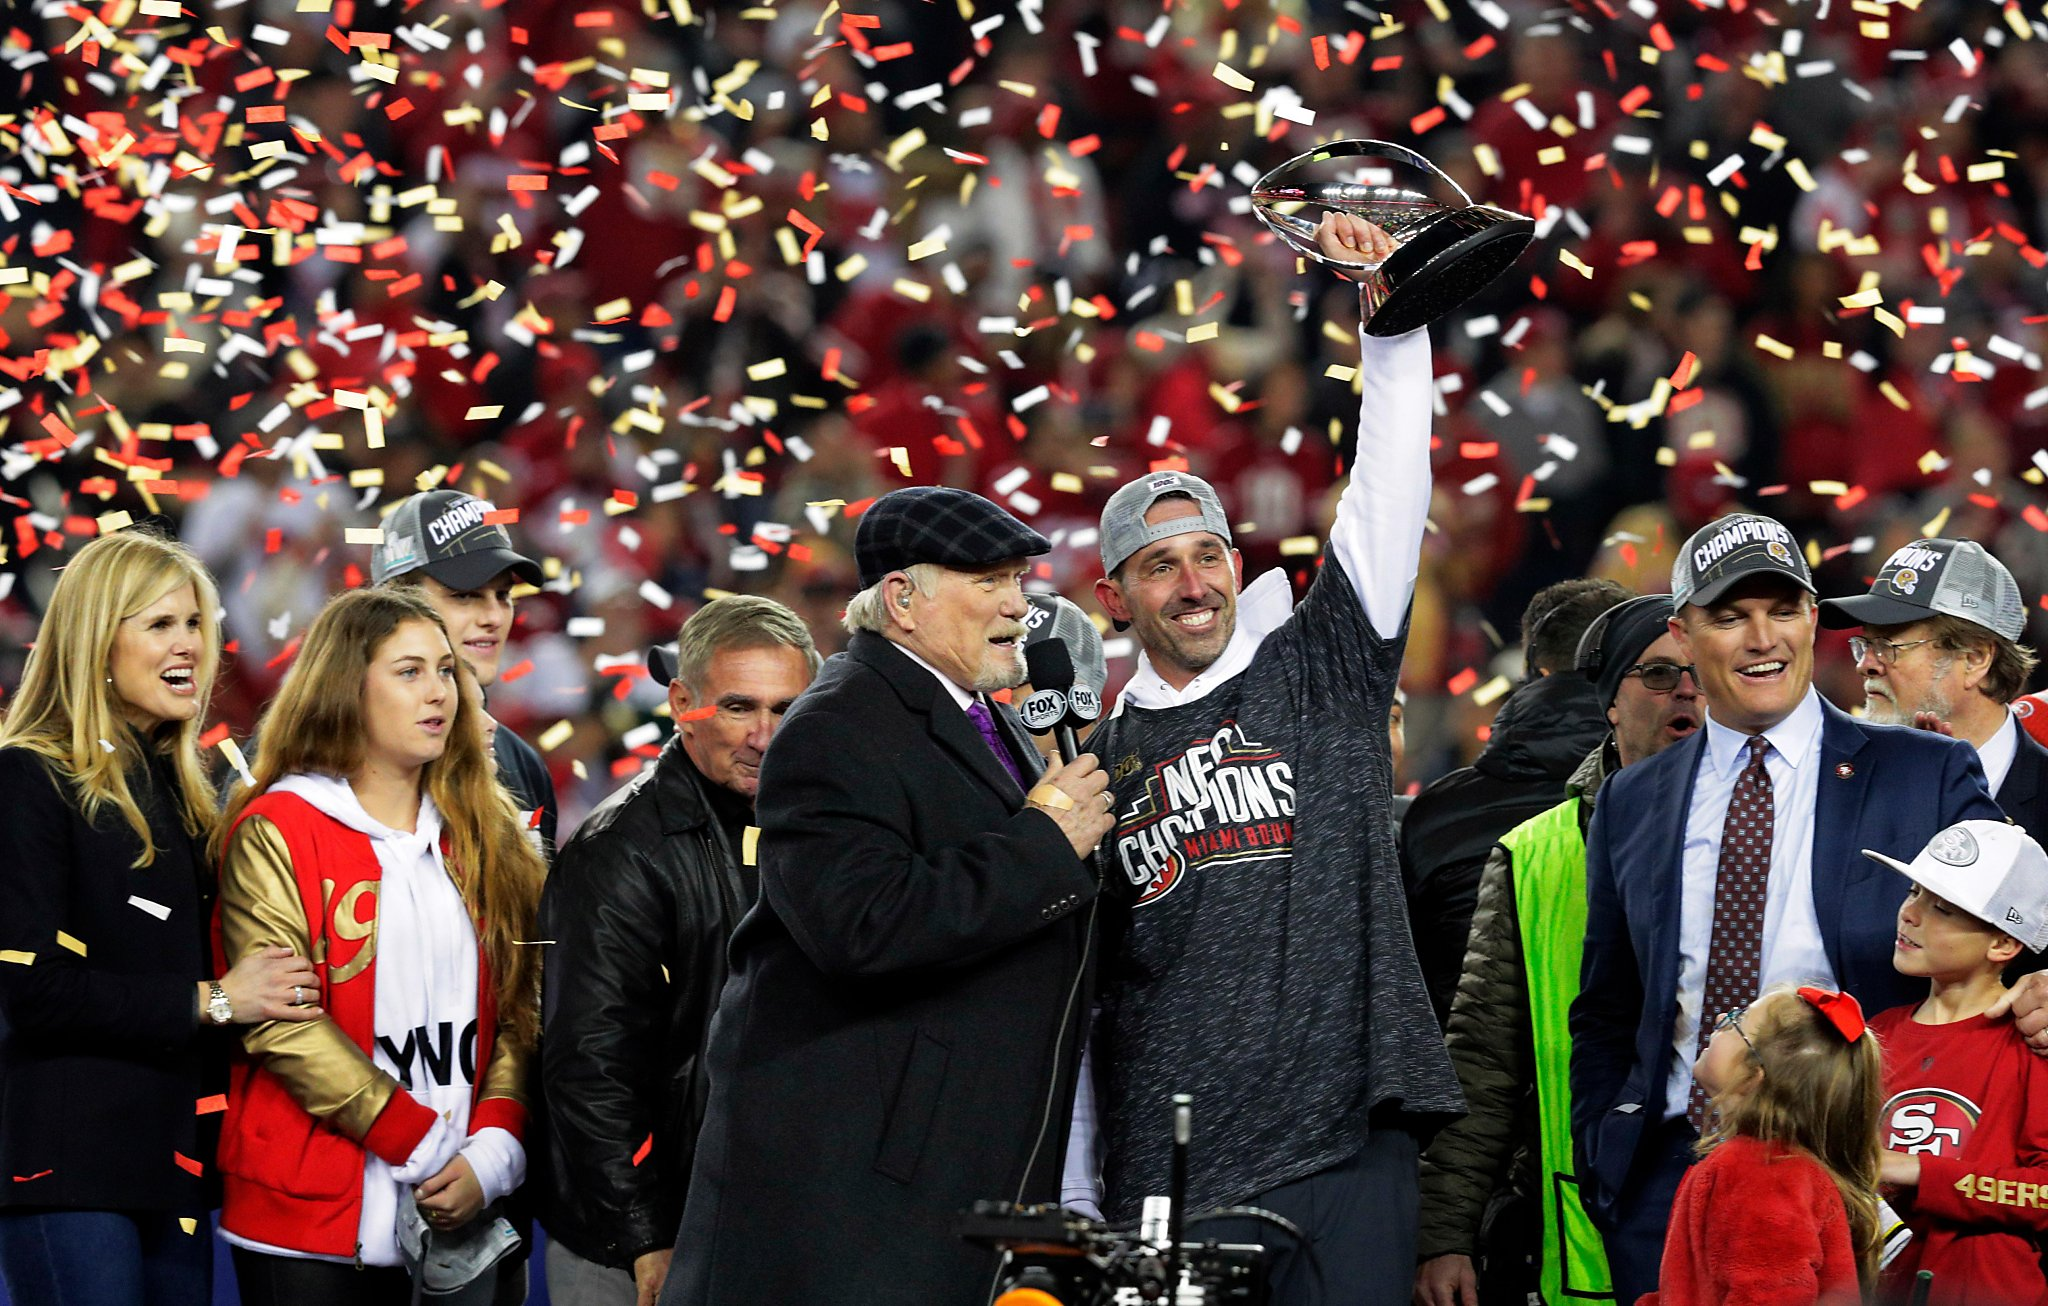 「49ers won kyle shanahan」の画像検索結果